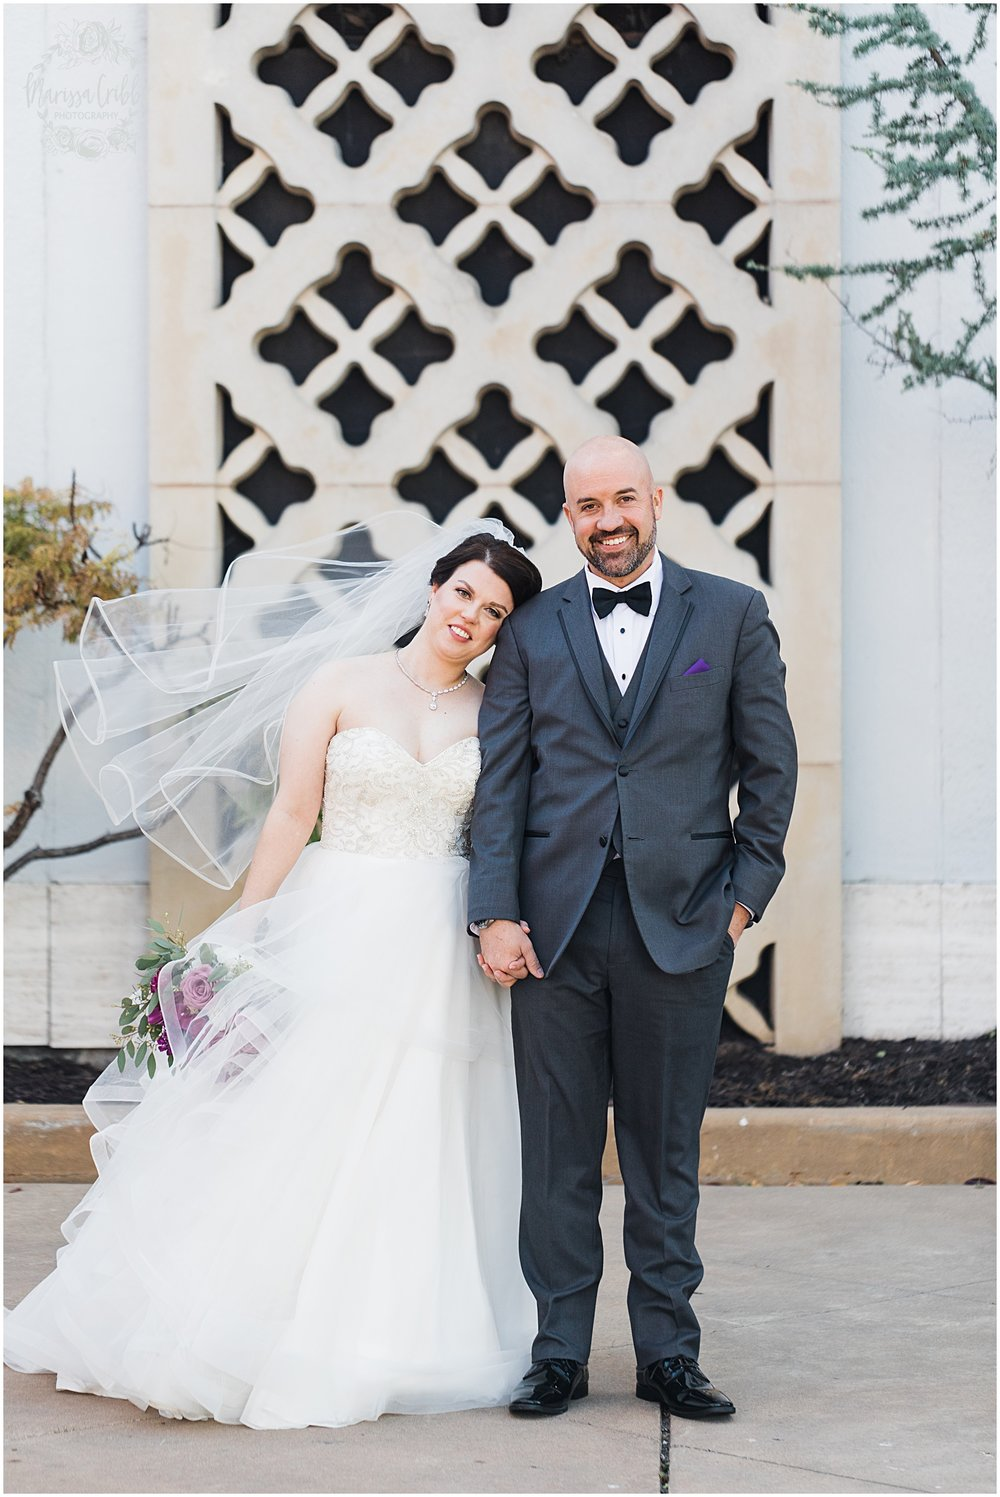 LAURA & DAN MARRIED | NELSON ATKINS MUSEUM | MARISSA CRIBBS PHOTOGRAPHY_7013.jpg